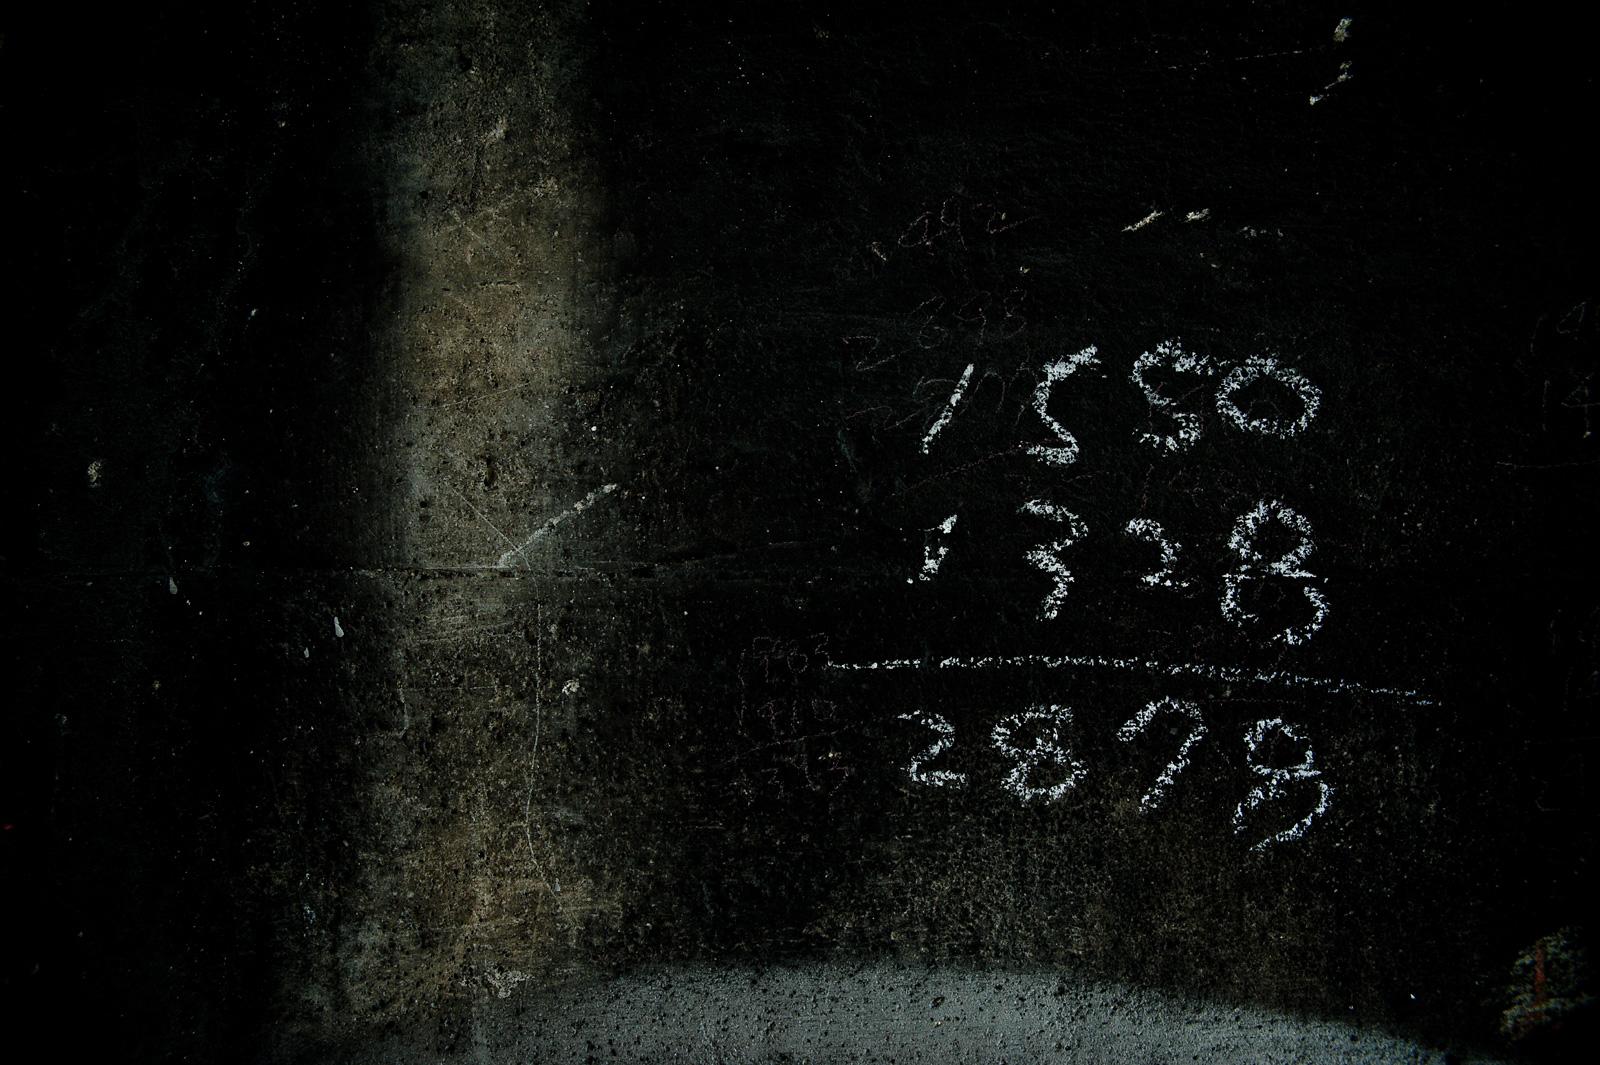 130920m_4606